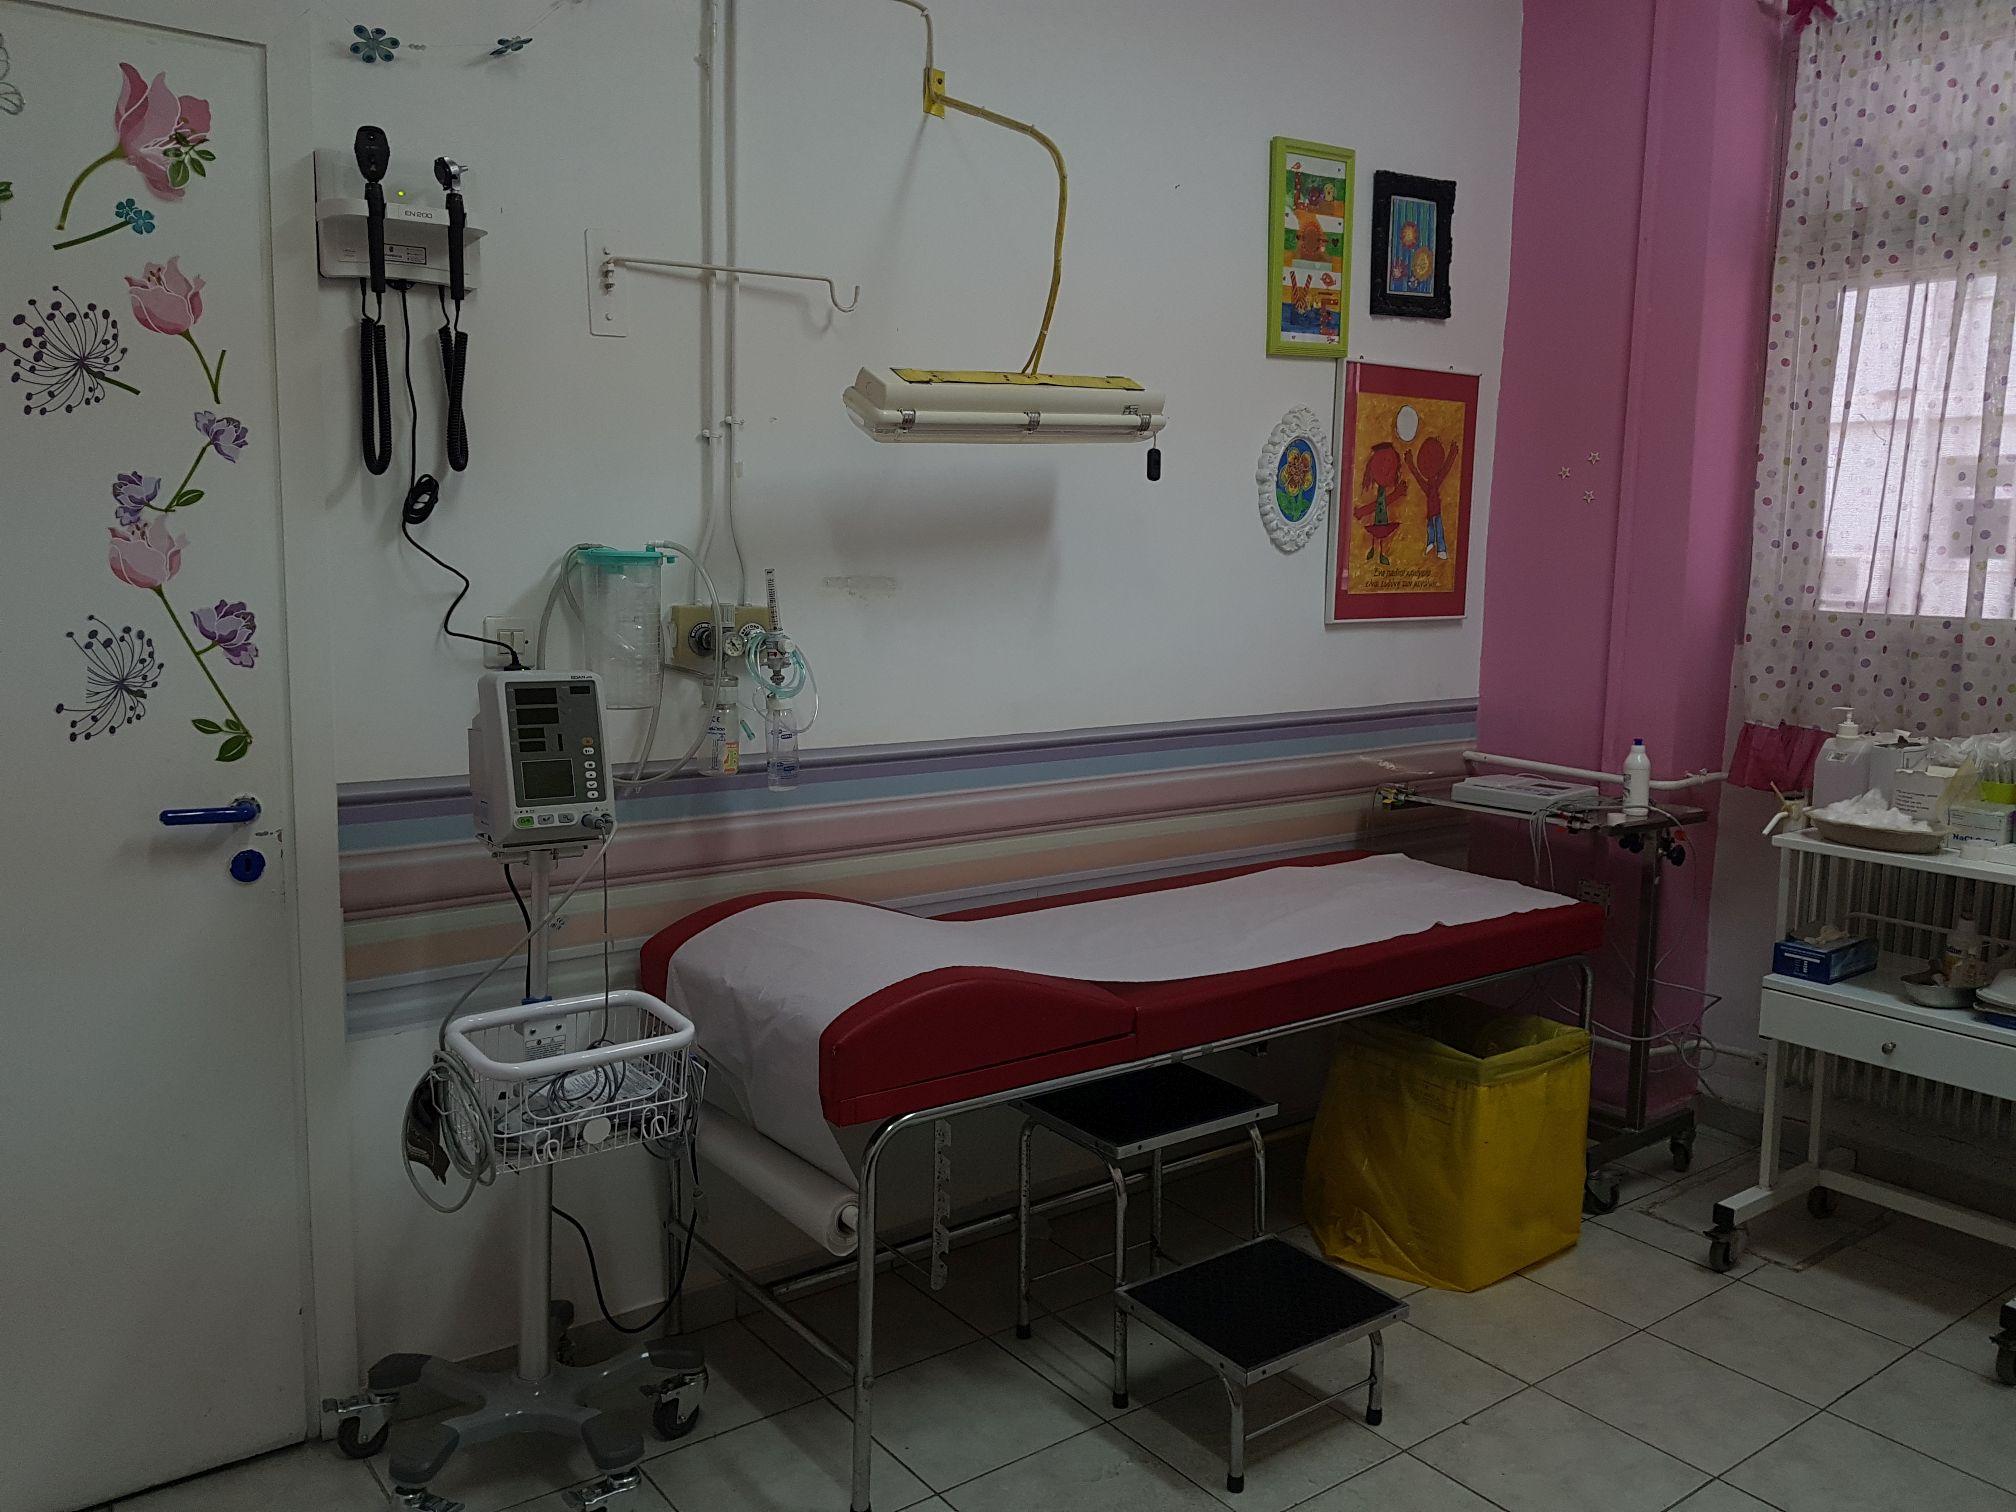 karditsa monitor ofthalmoskopio otoskopio